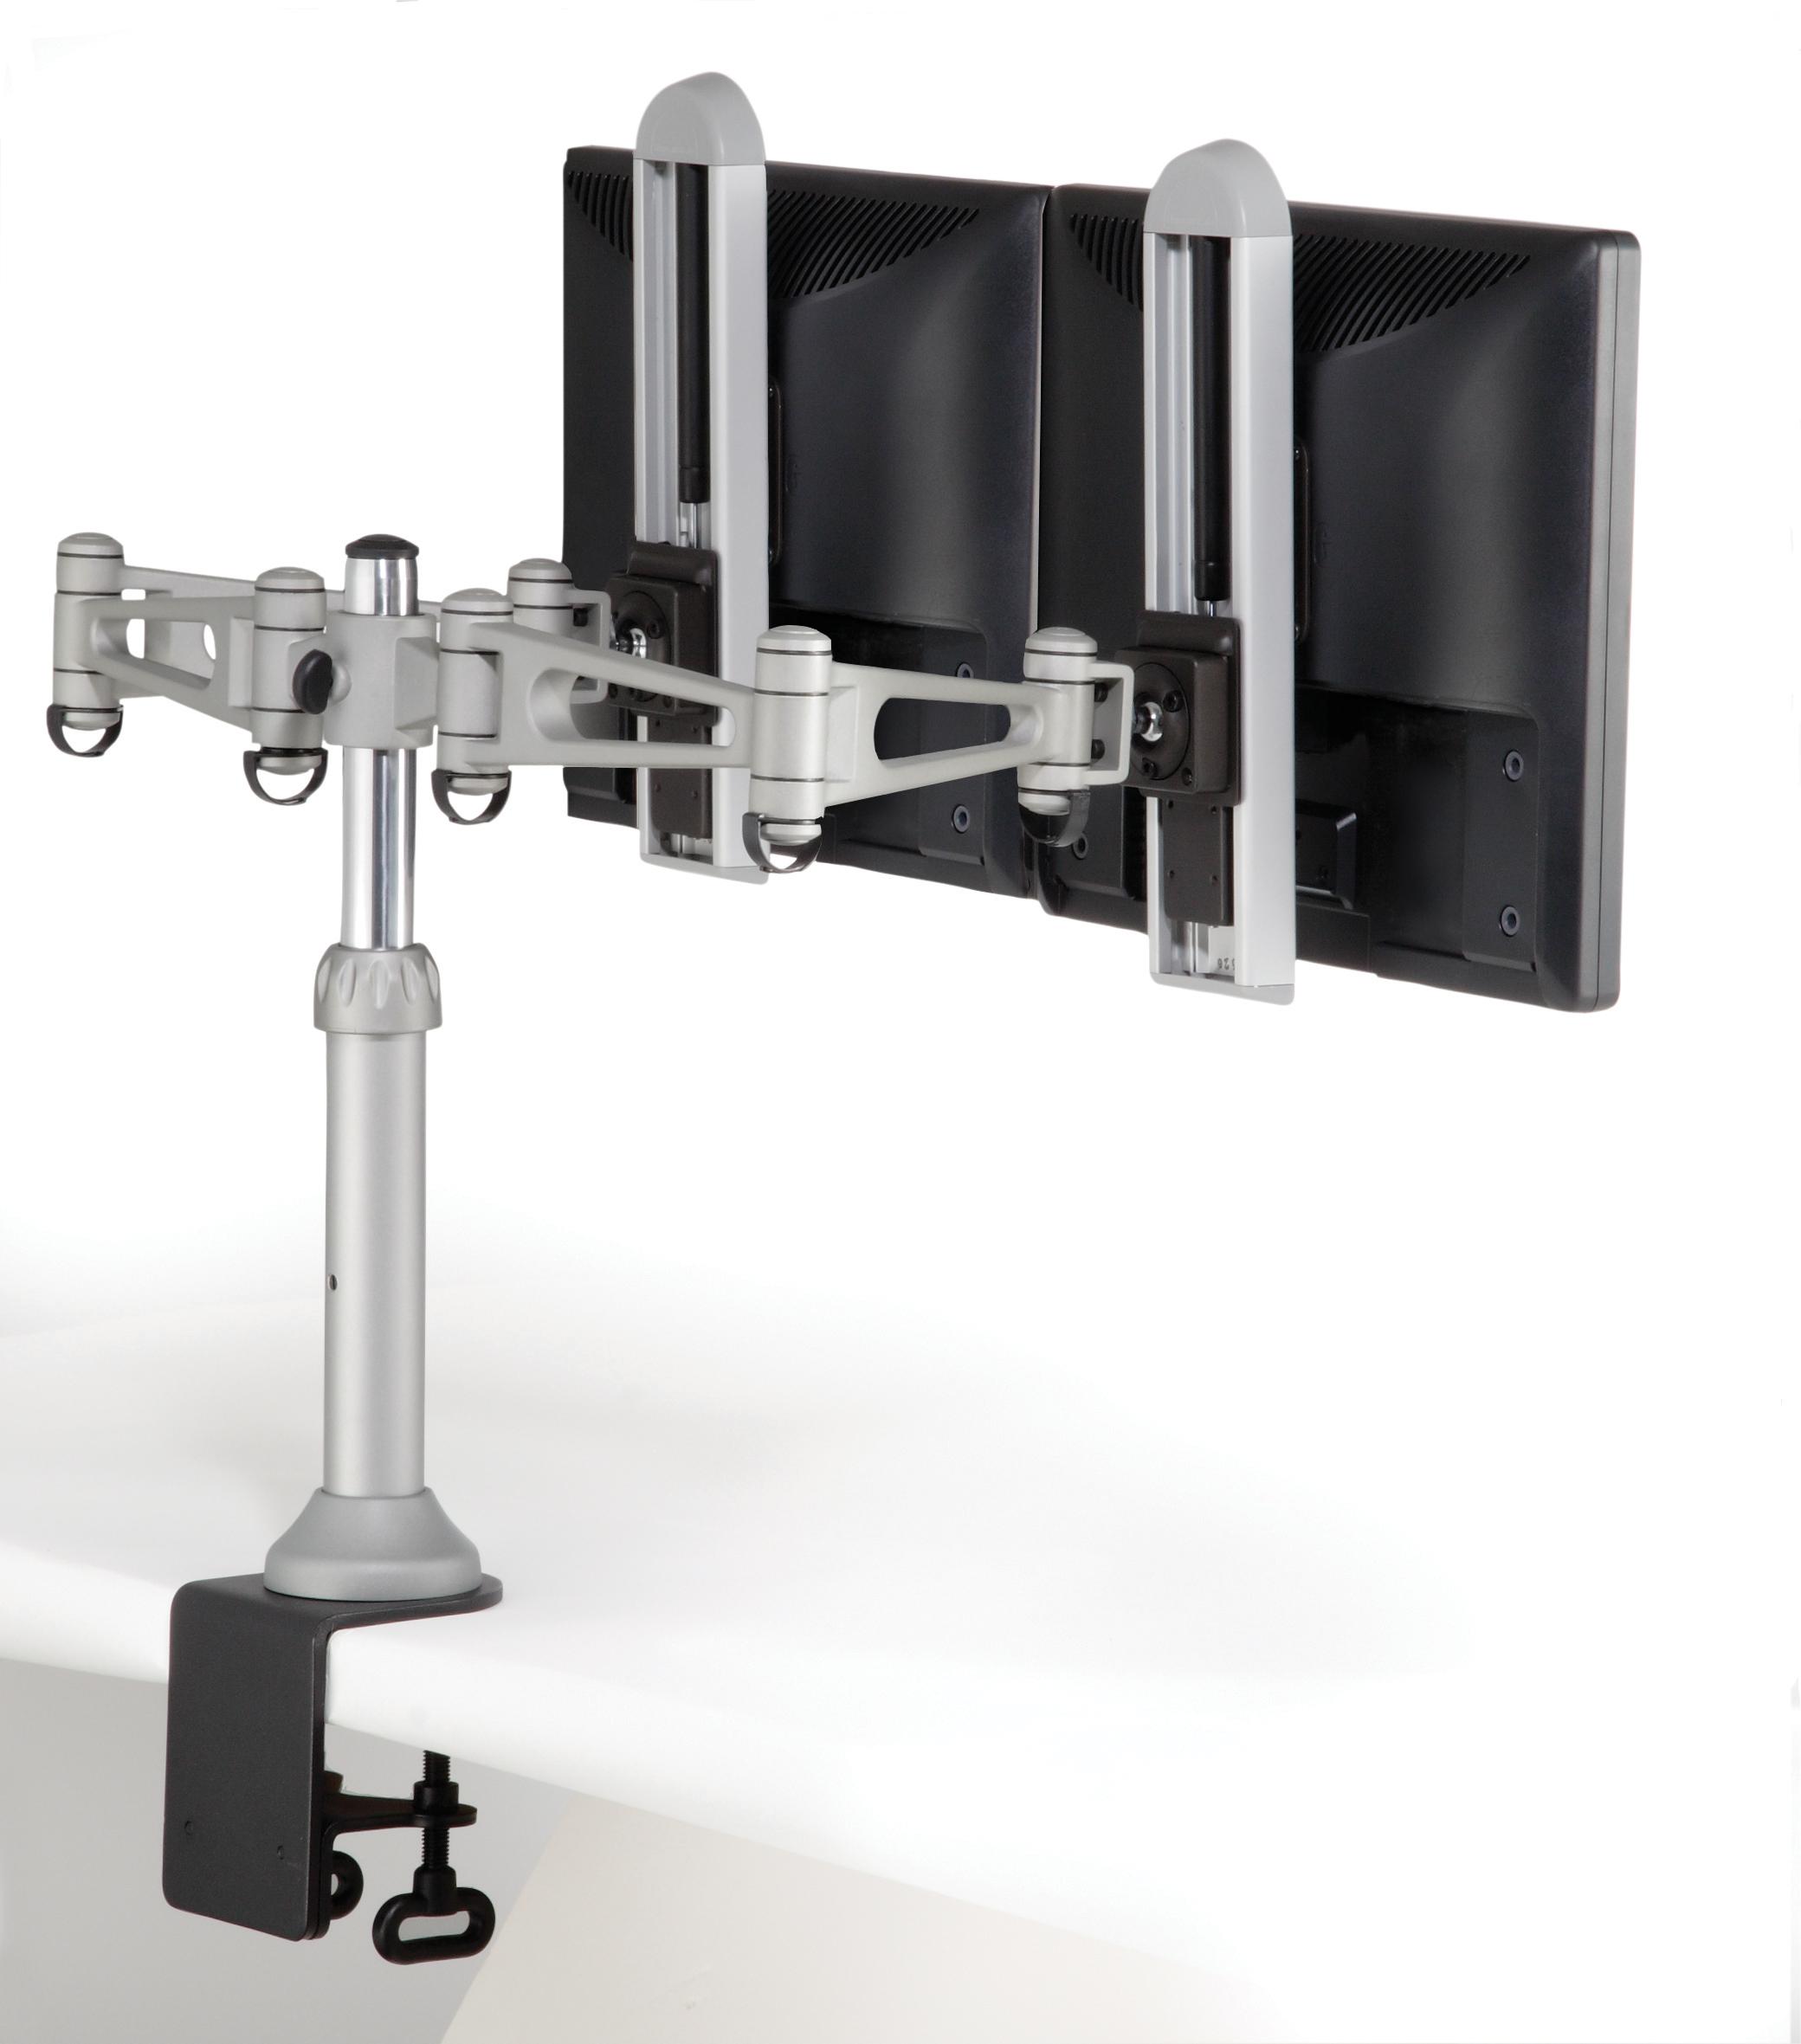 Rdm  Ergonomic Monitor Arm Products. Usb Desk Fan Pc World. Pottery Table. Cool Gaming Desks. Bunk Beds Desk. Bungee Cord Desk Chair. Ikea Effektiv Desk. Automatic Desk. 2 Drawer Legal File Cabinet